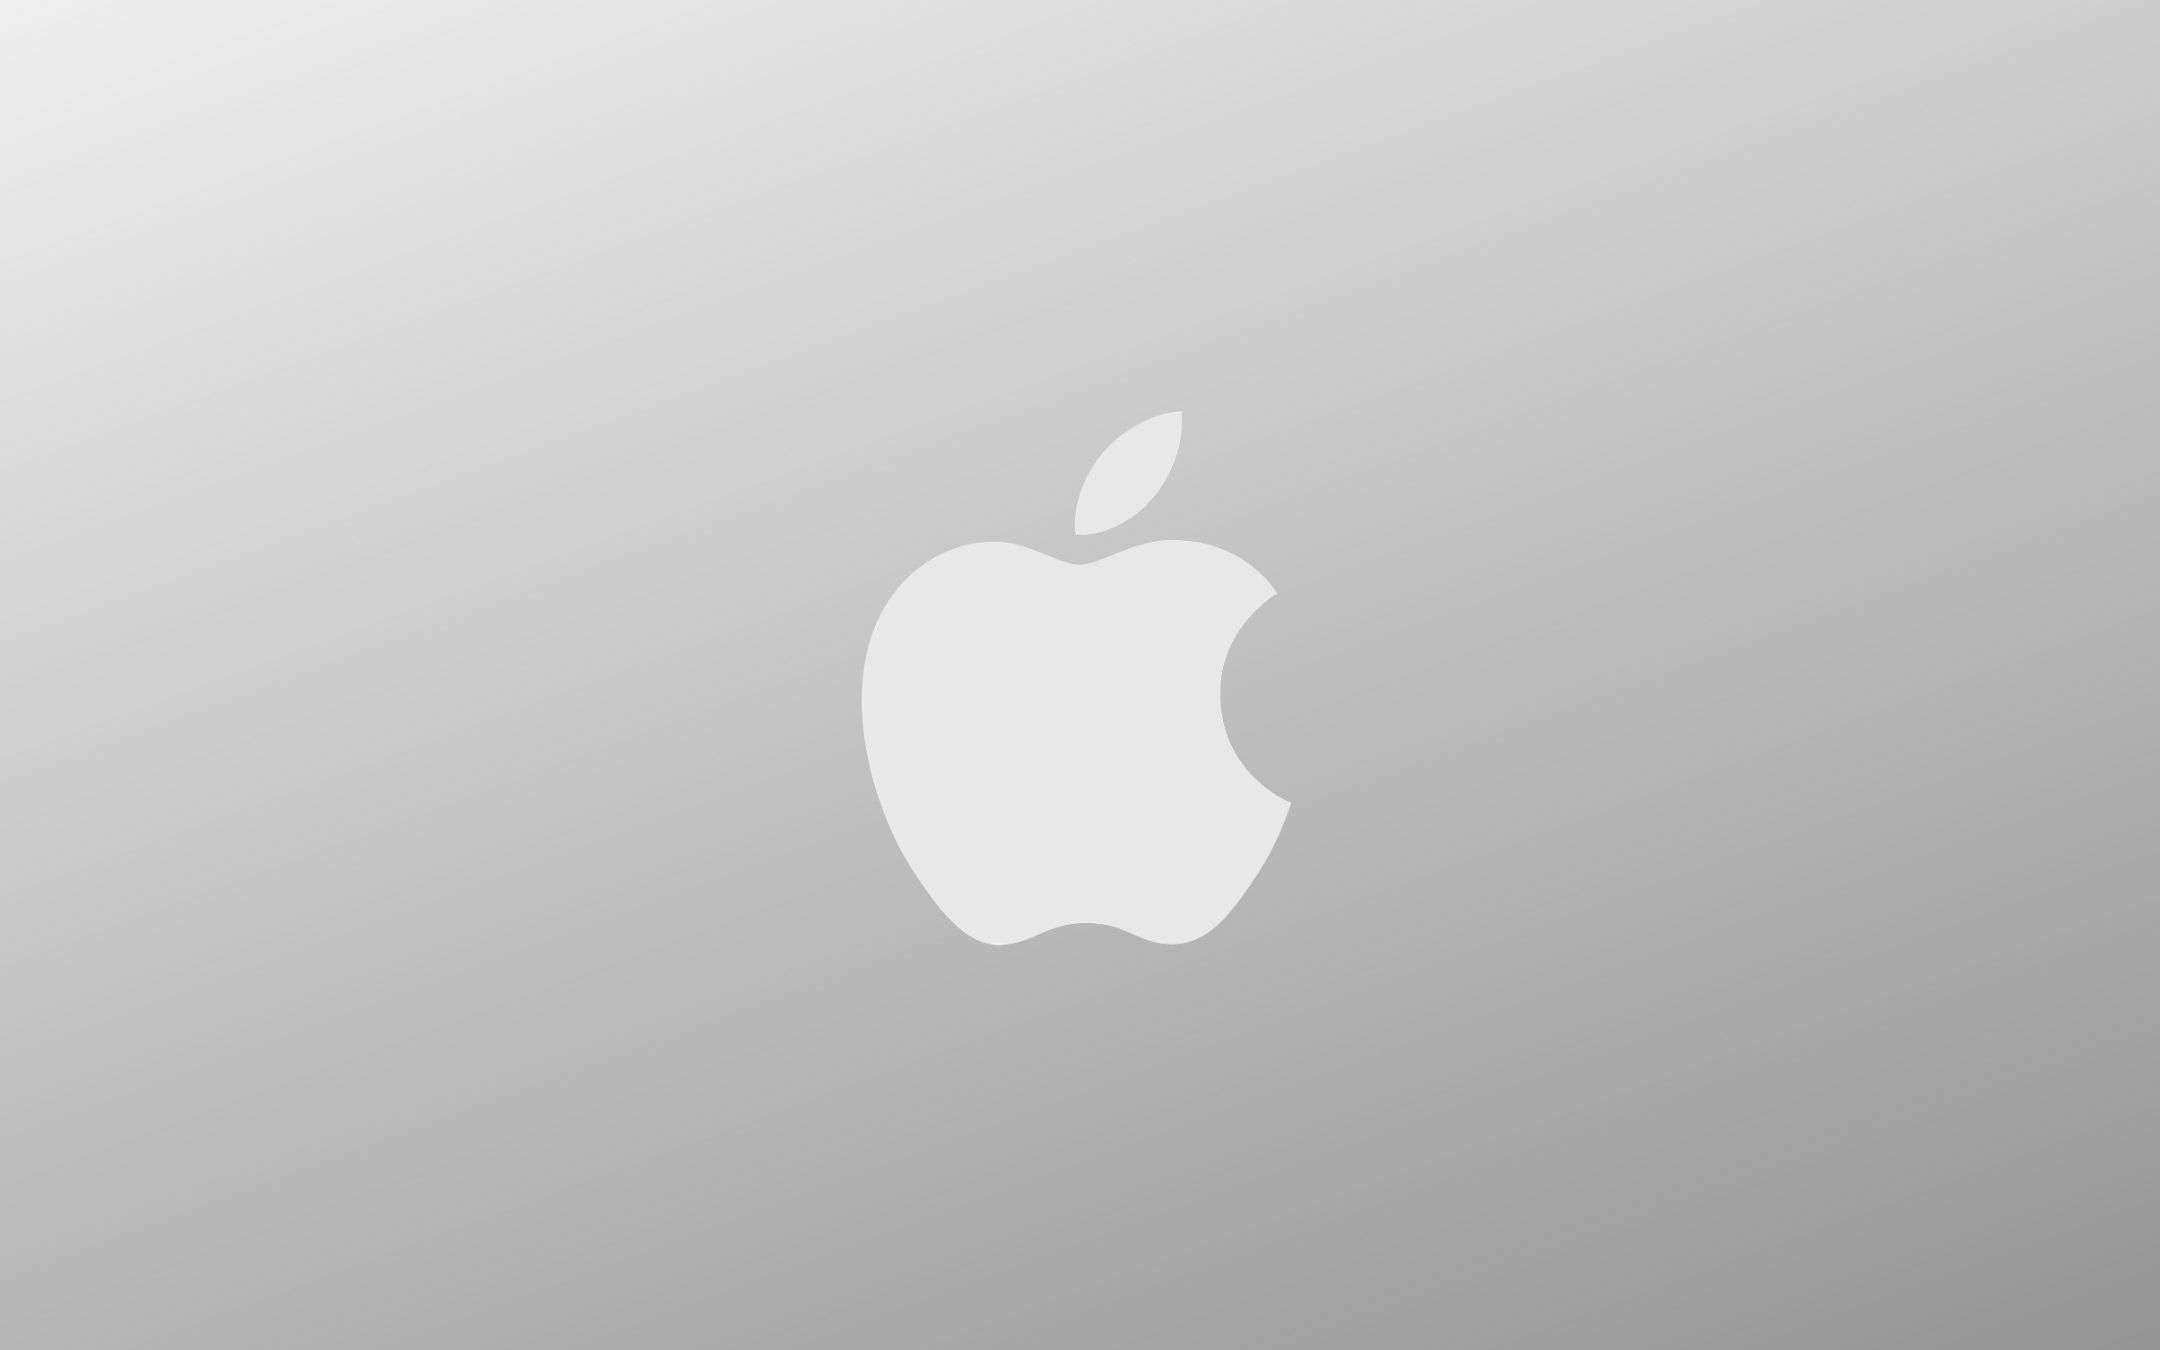 Apple sta eliminando lo smart working: che succede?